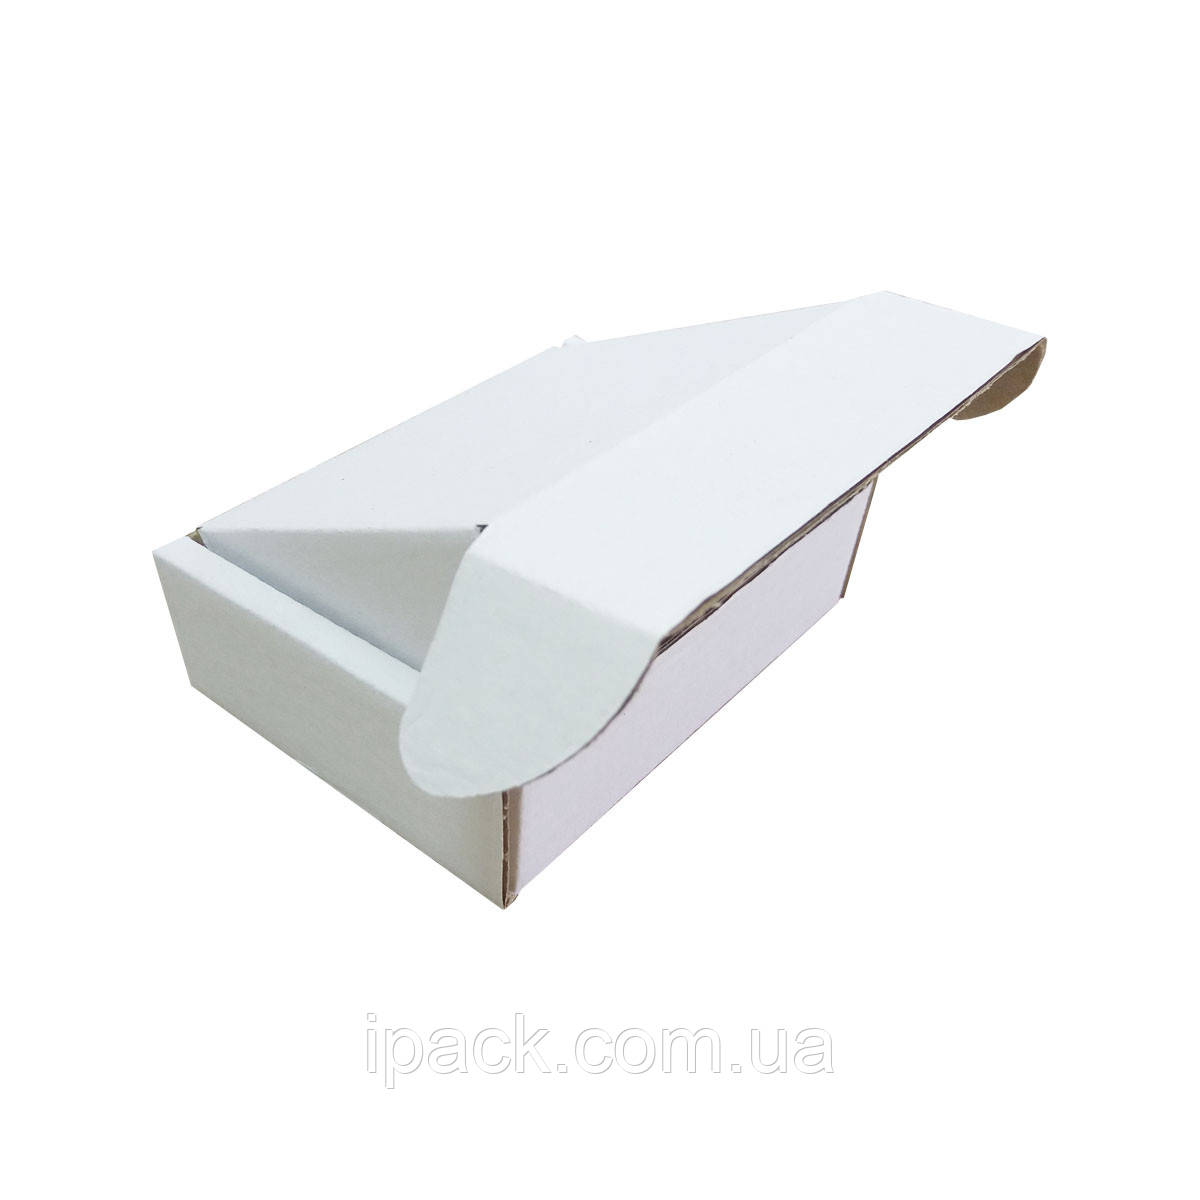 Коробка картонная самосборная, 85*70*30, мм, белая, микрогофрокартон